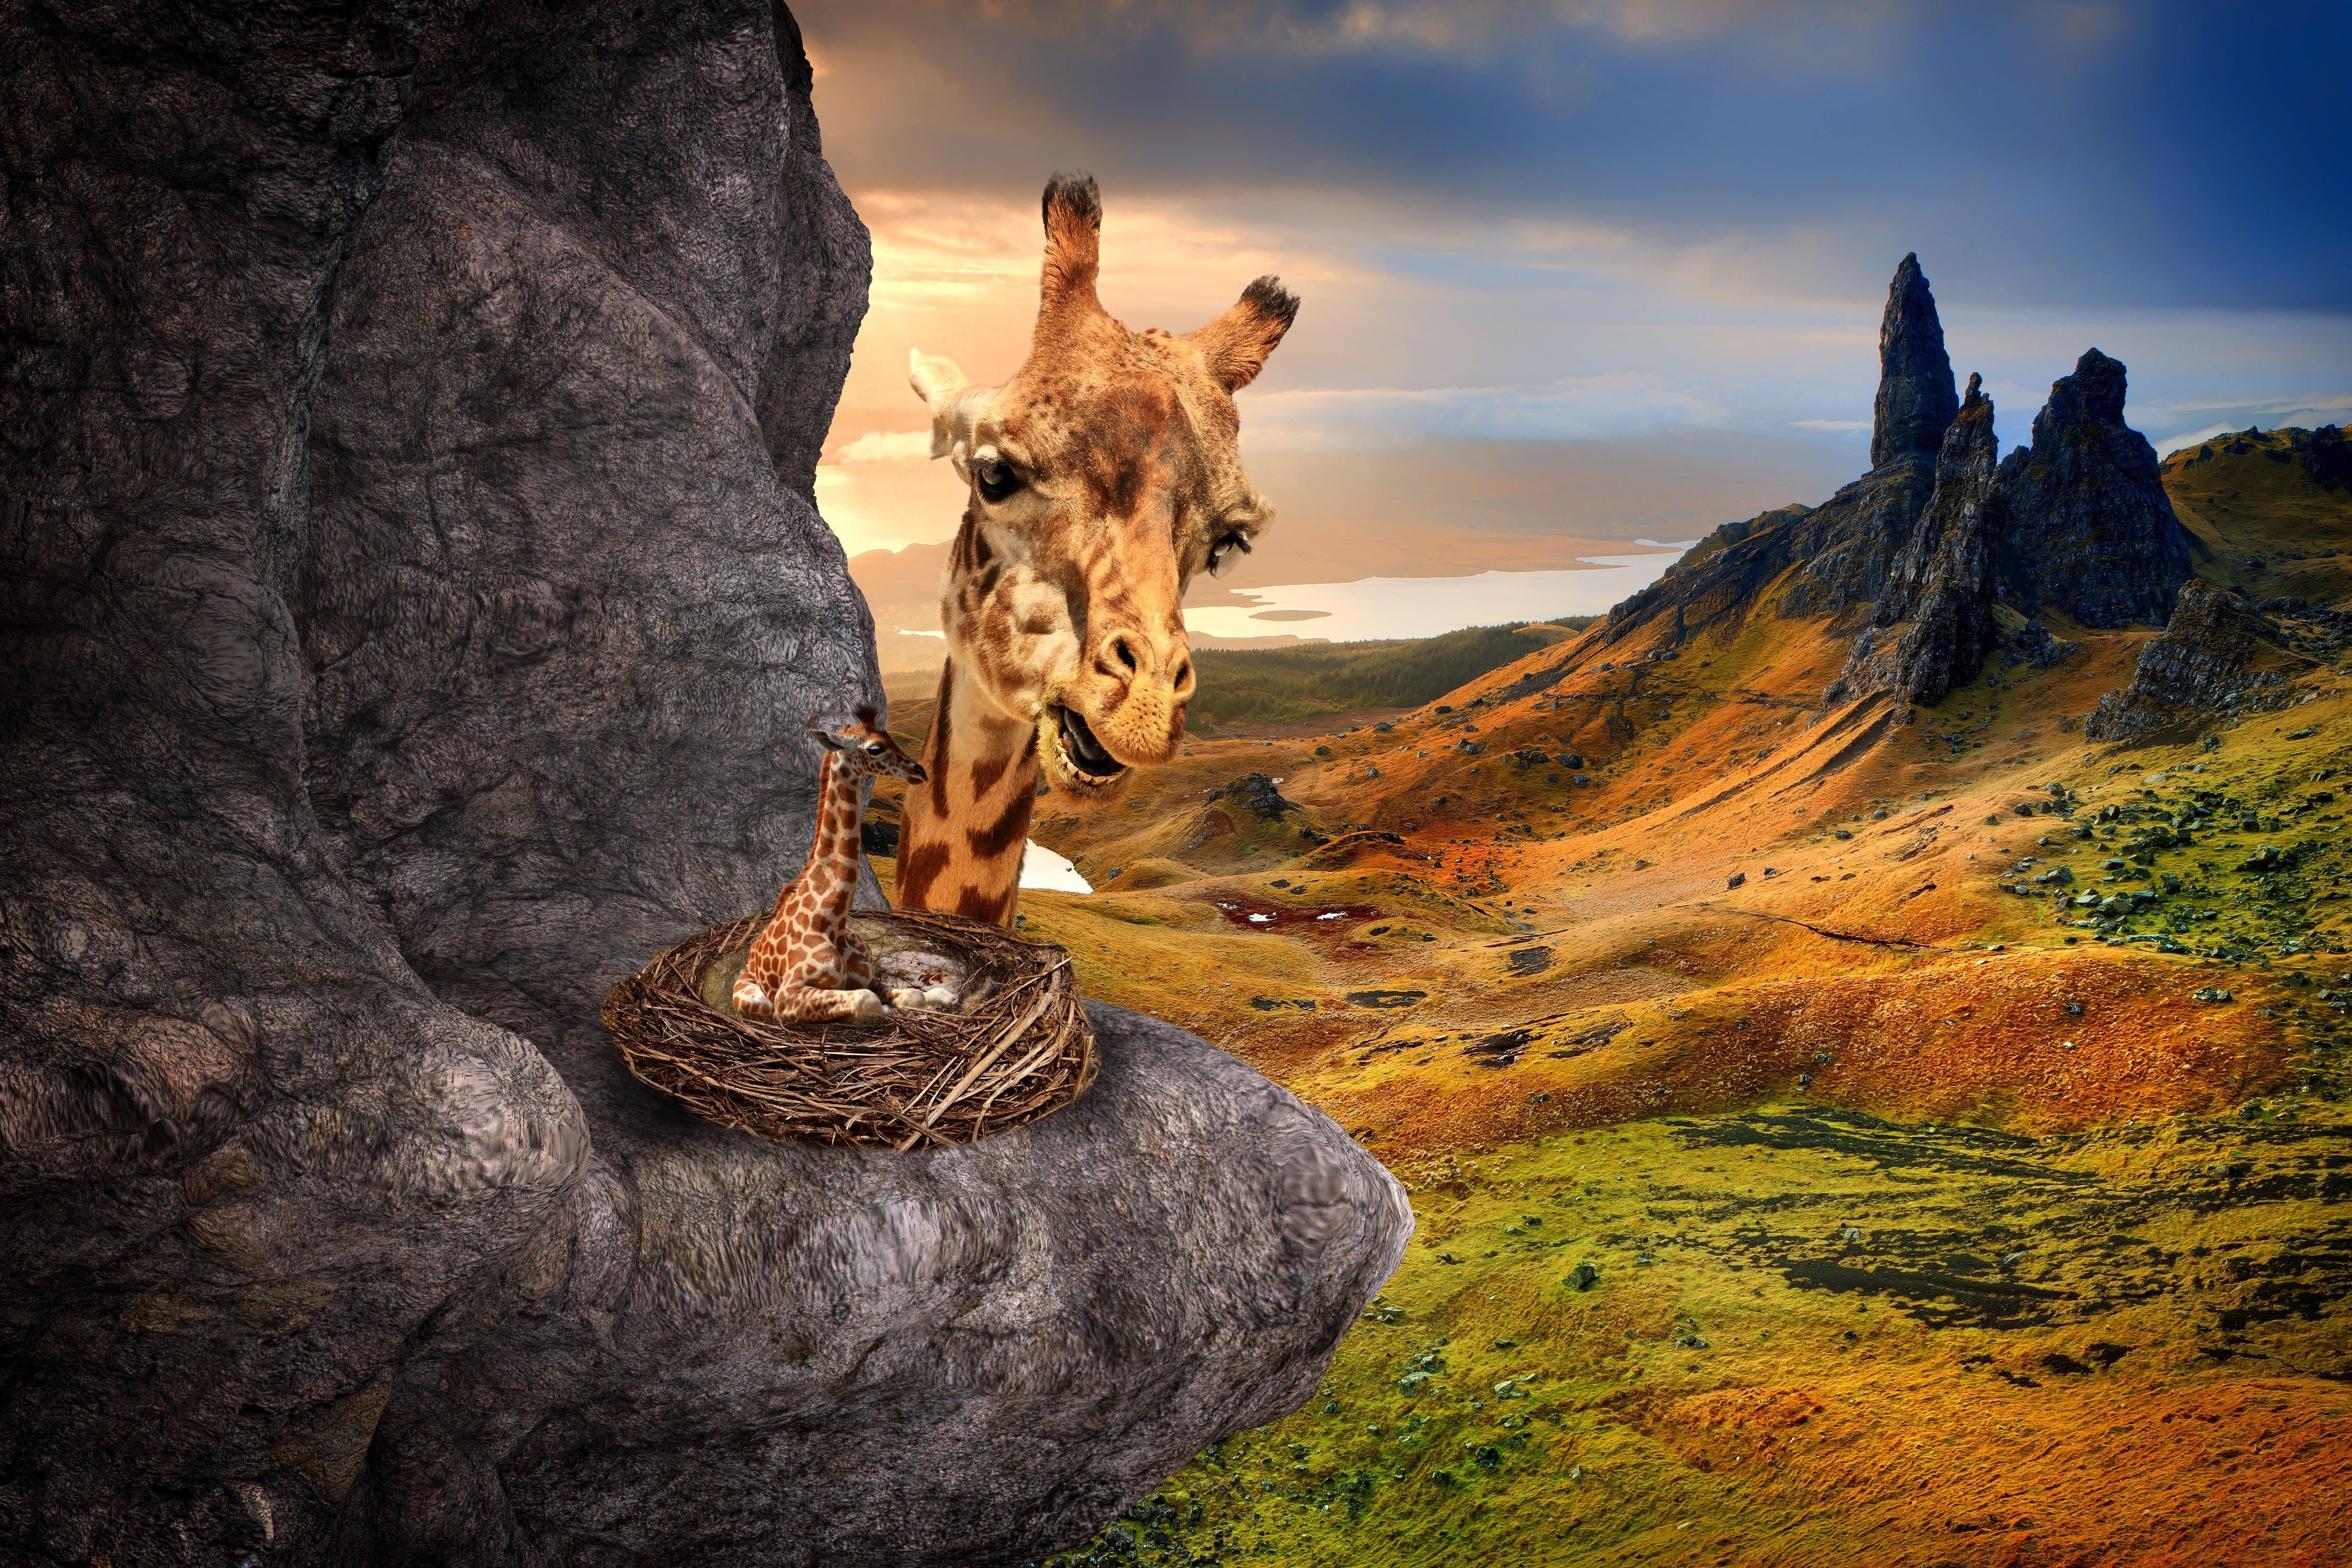 Free stock photo of landscape, hidden, surreal, fantasy